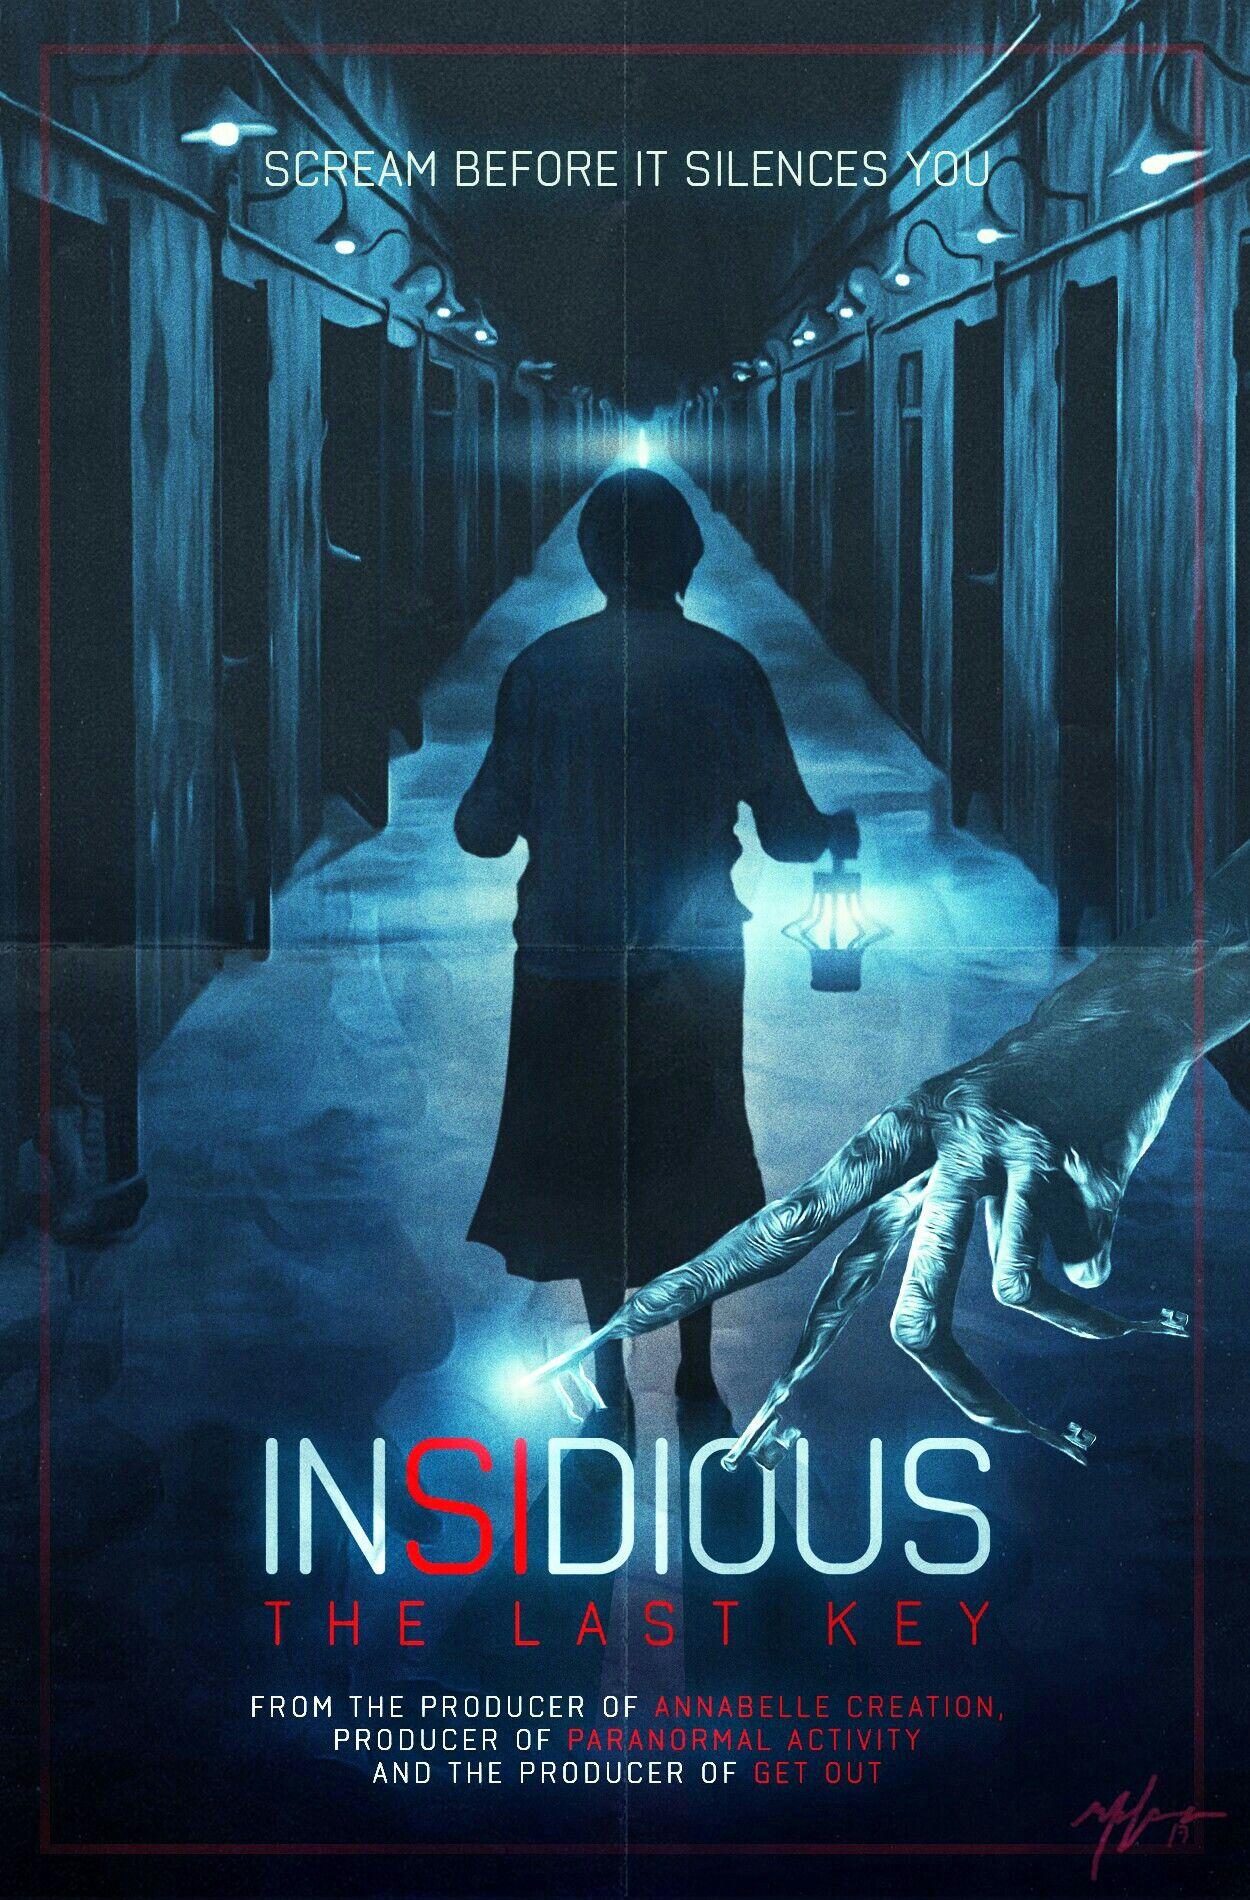 Insidious Design 5 Insidious Movie Insidious Horror Movie Posters